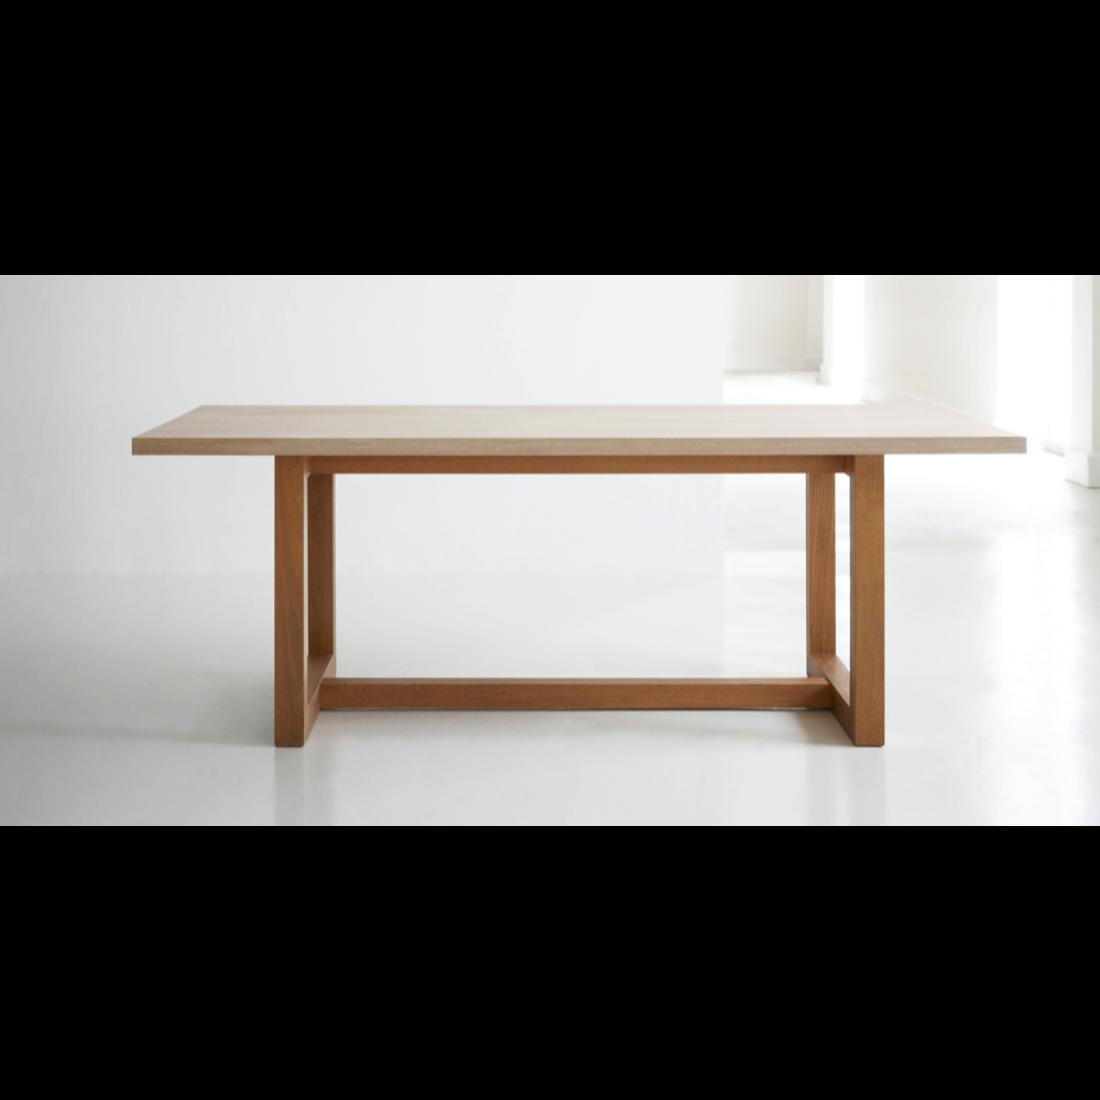 Sensational Islington Custom Table Bench Ibusinesslaw Wood Chair Design Ideas Ibusinesslaworg